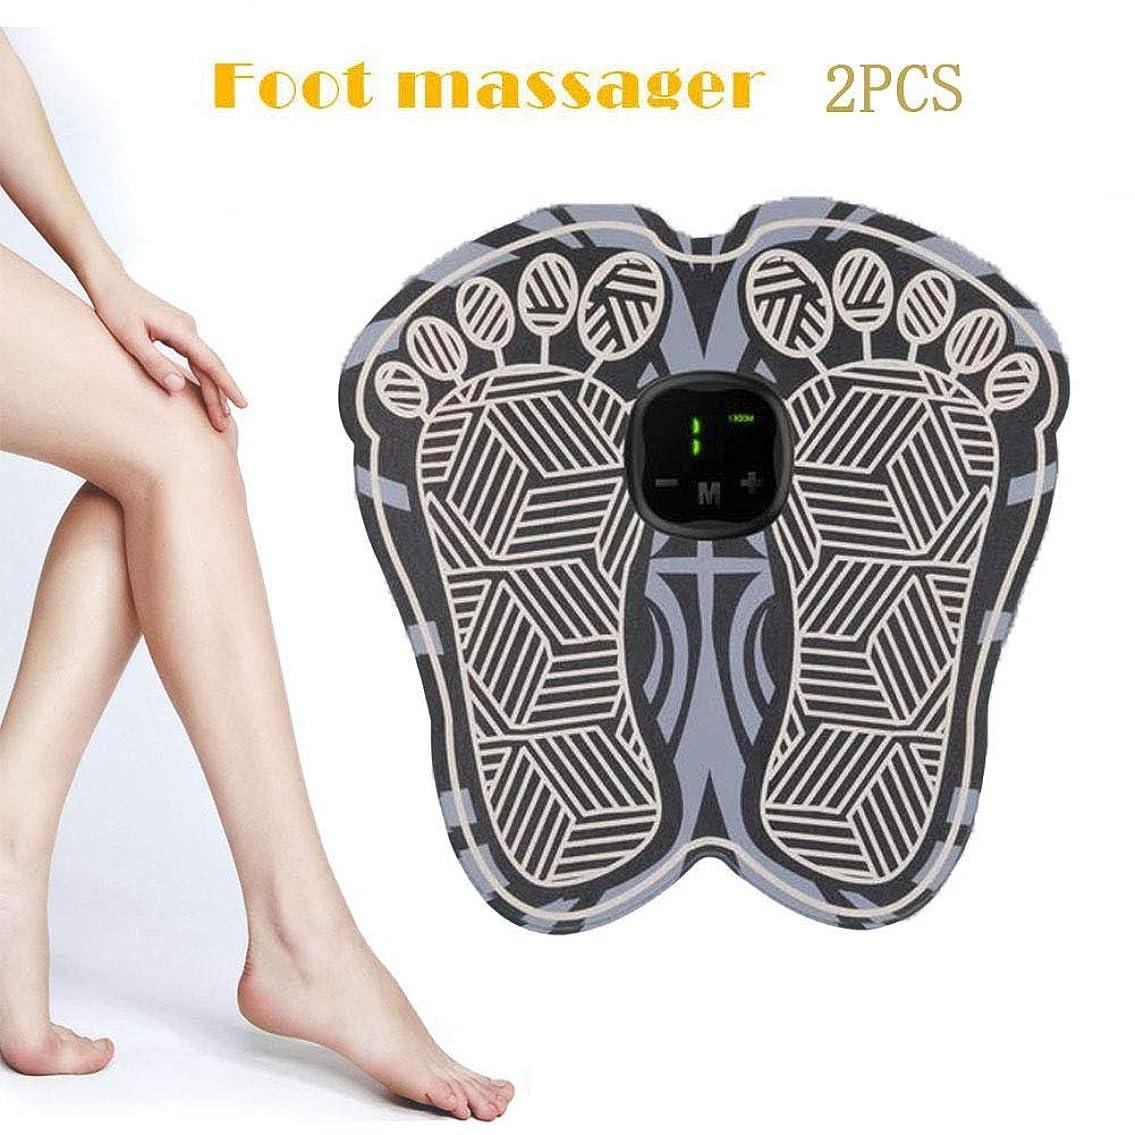 EMSフットマッサージャー、スマートマッサージパッド、足の振動指圧、多機能理学療法、デジタルディスプレイ、USB充電、足の疲労の緩和、2個